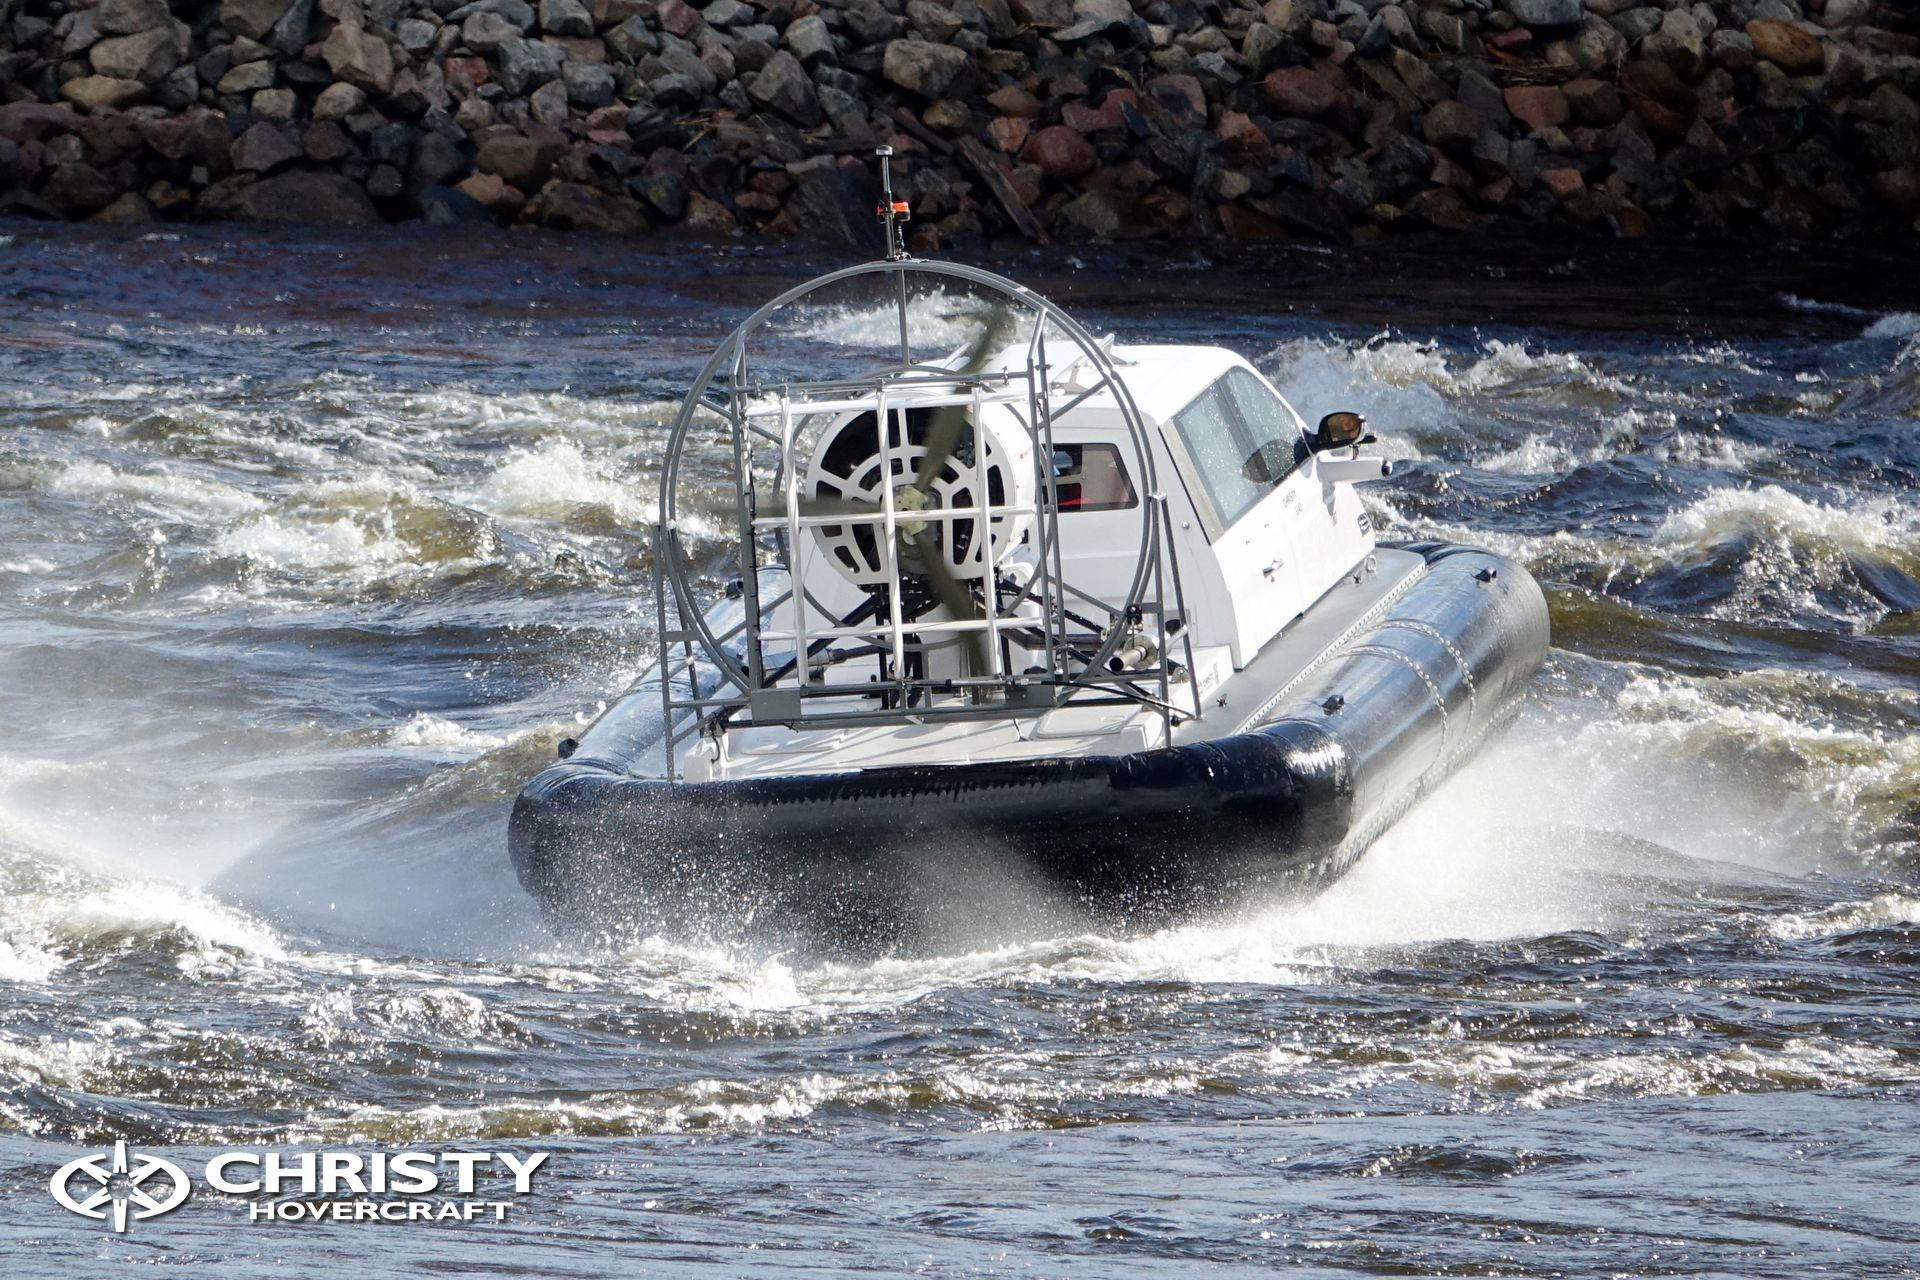 Hovercraft-Christy-5146-FC-16.jpg | фото №30